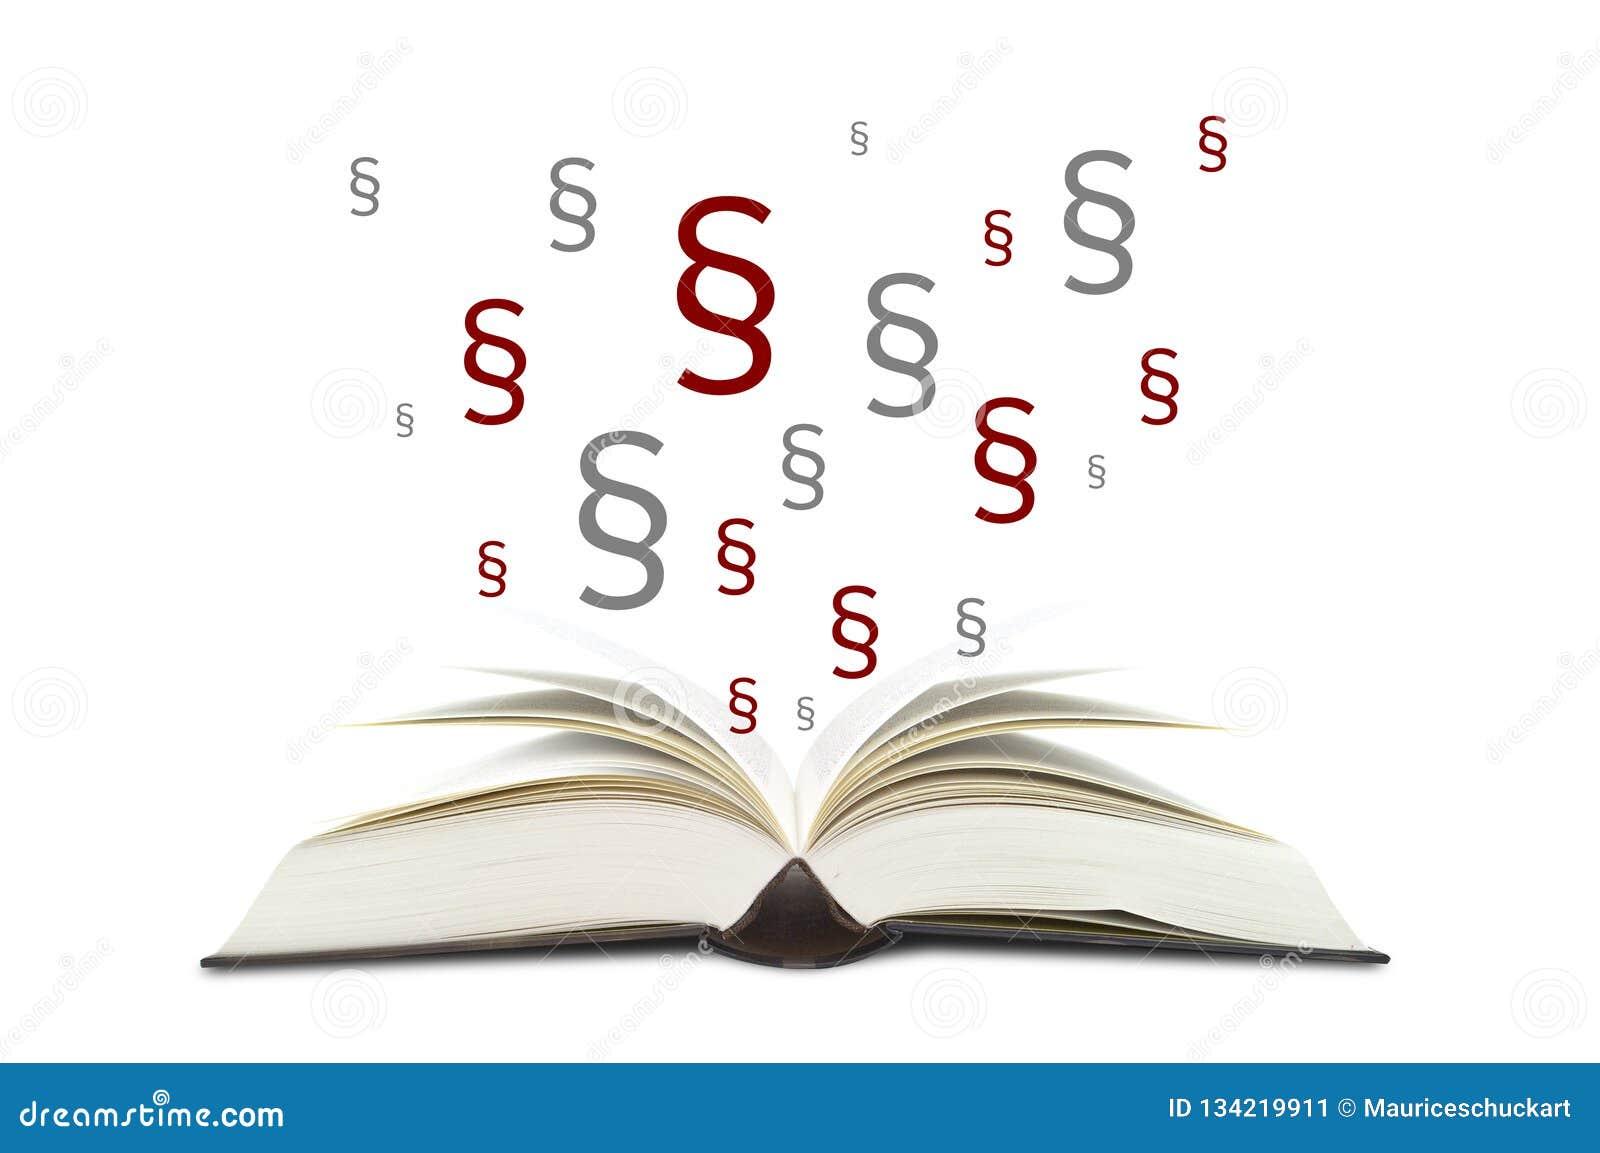 Книги с параграфами